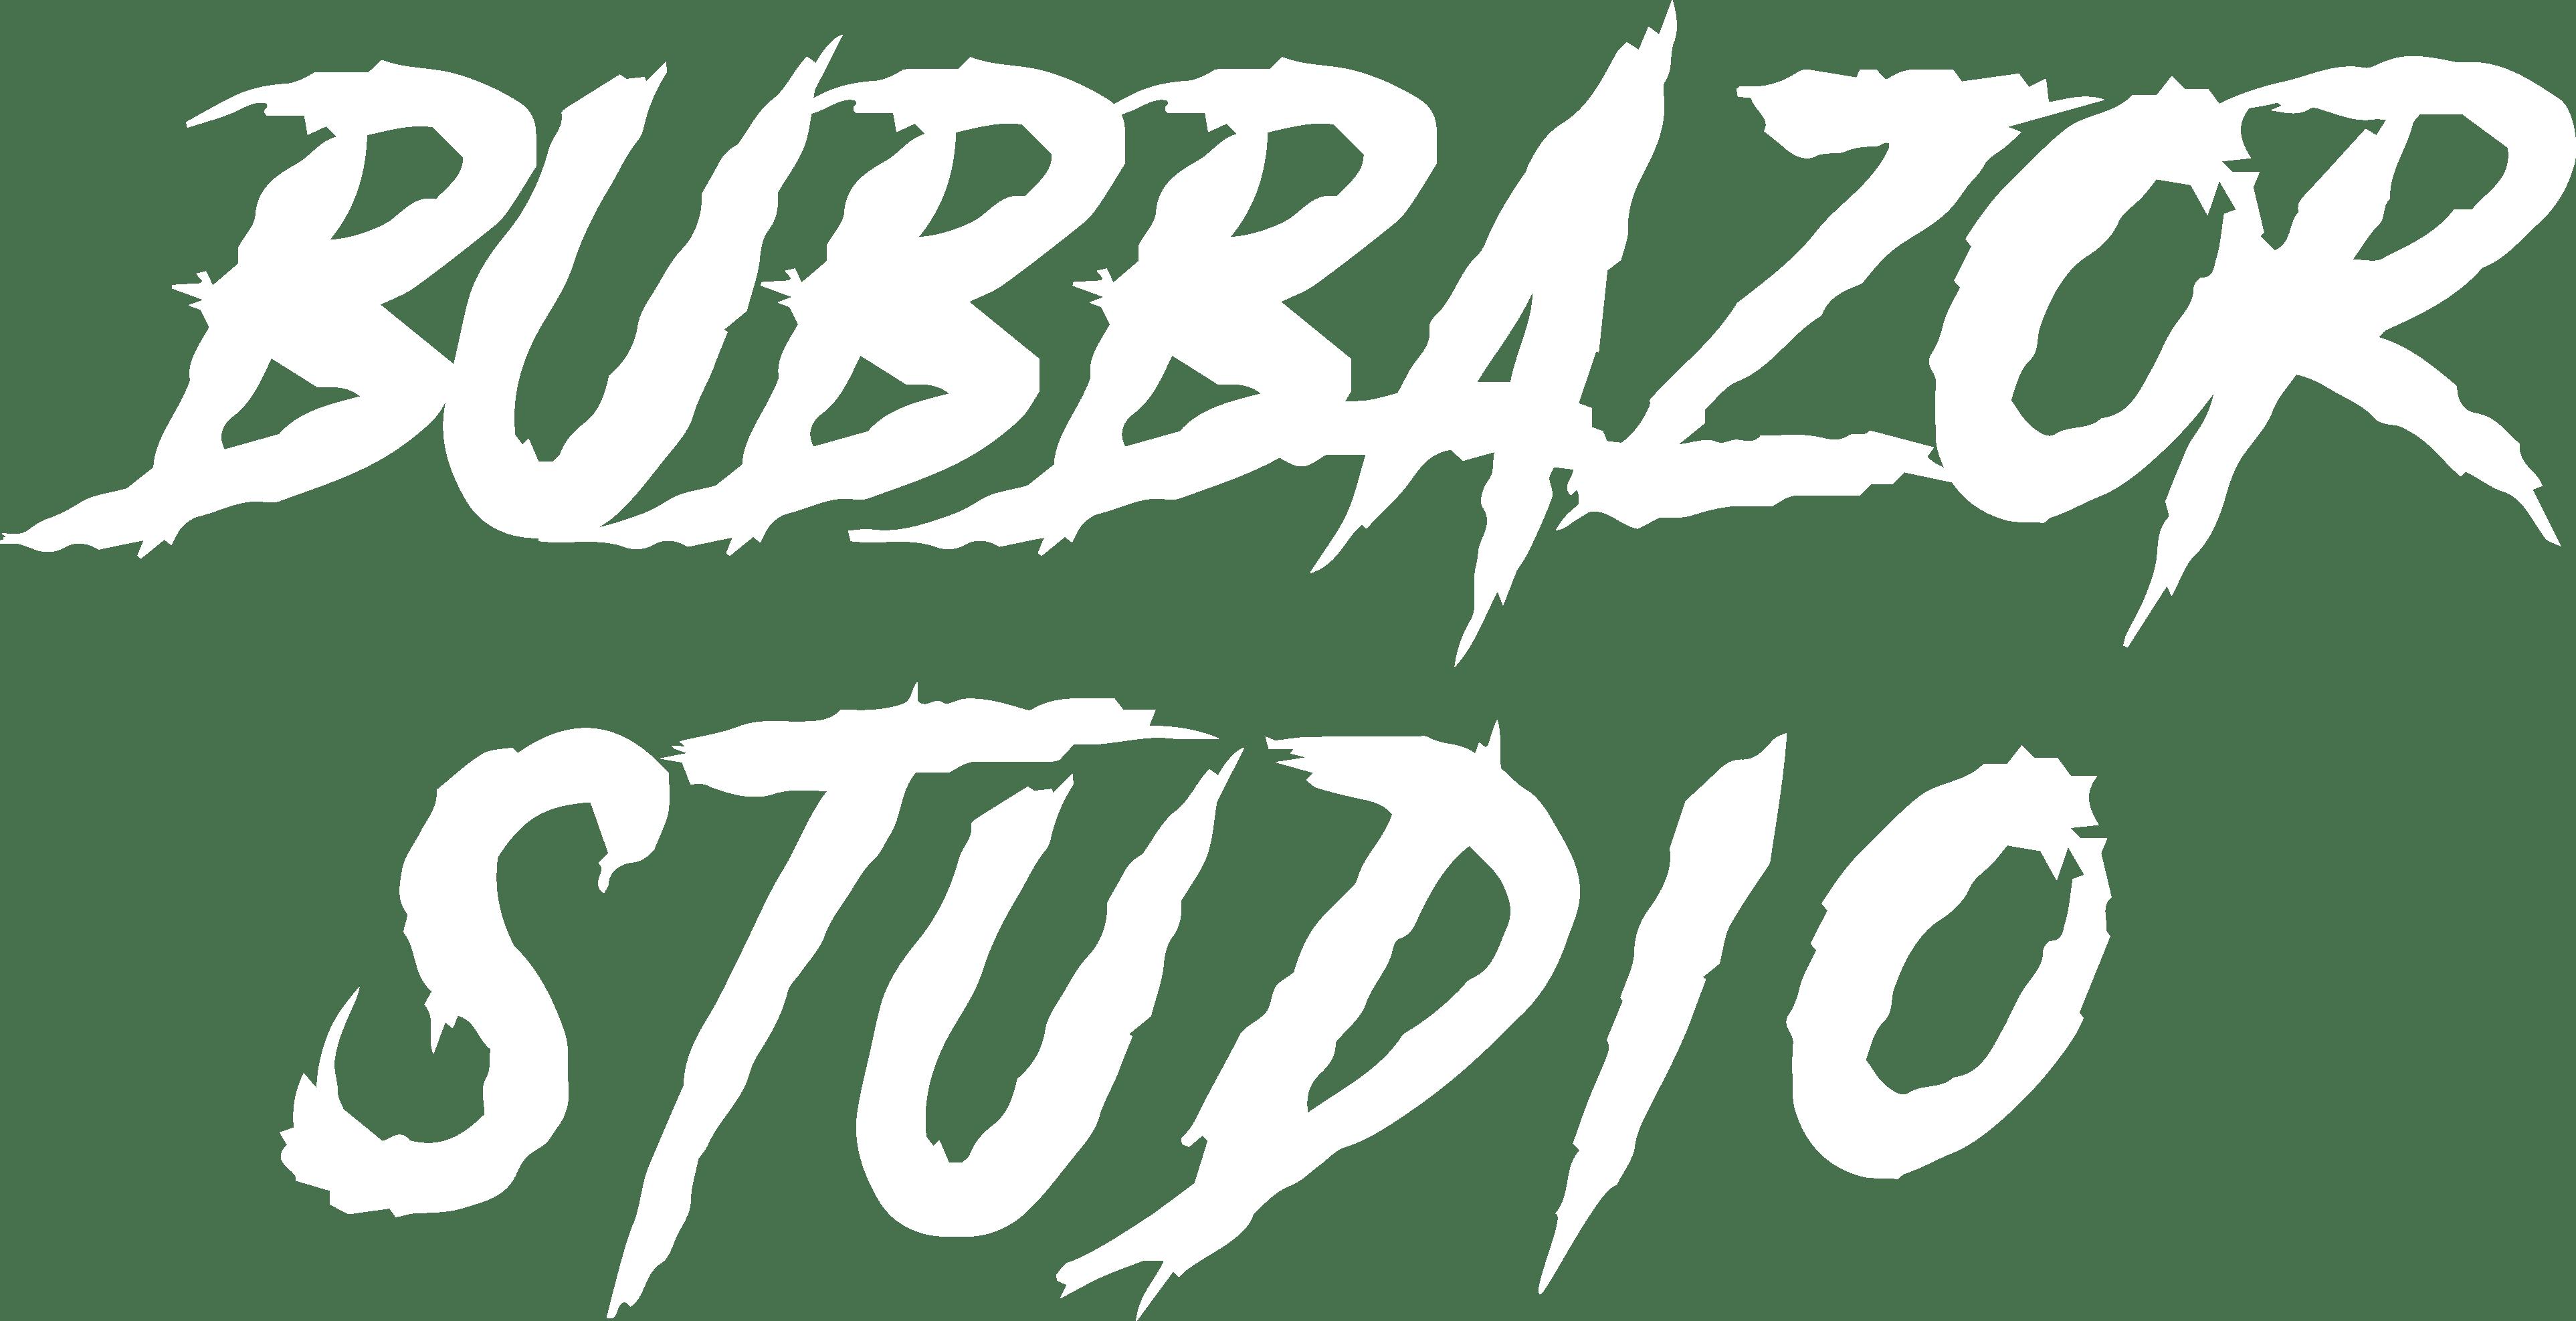 Bubbazor studio írott logo